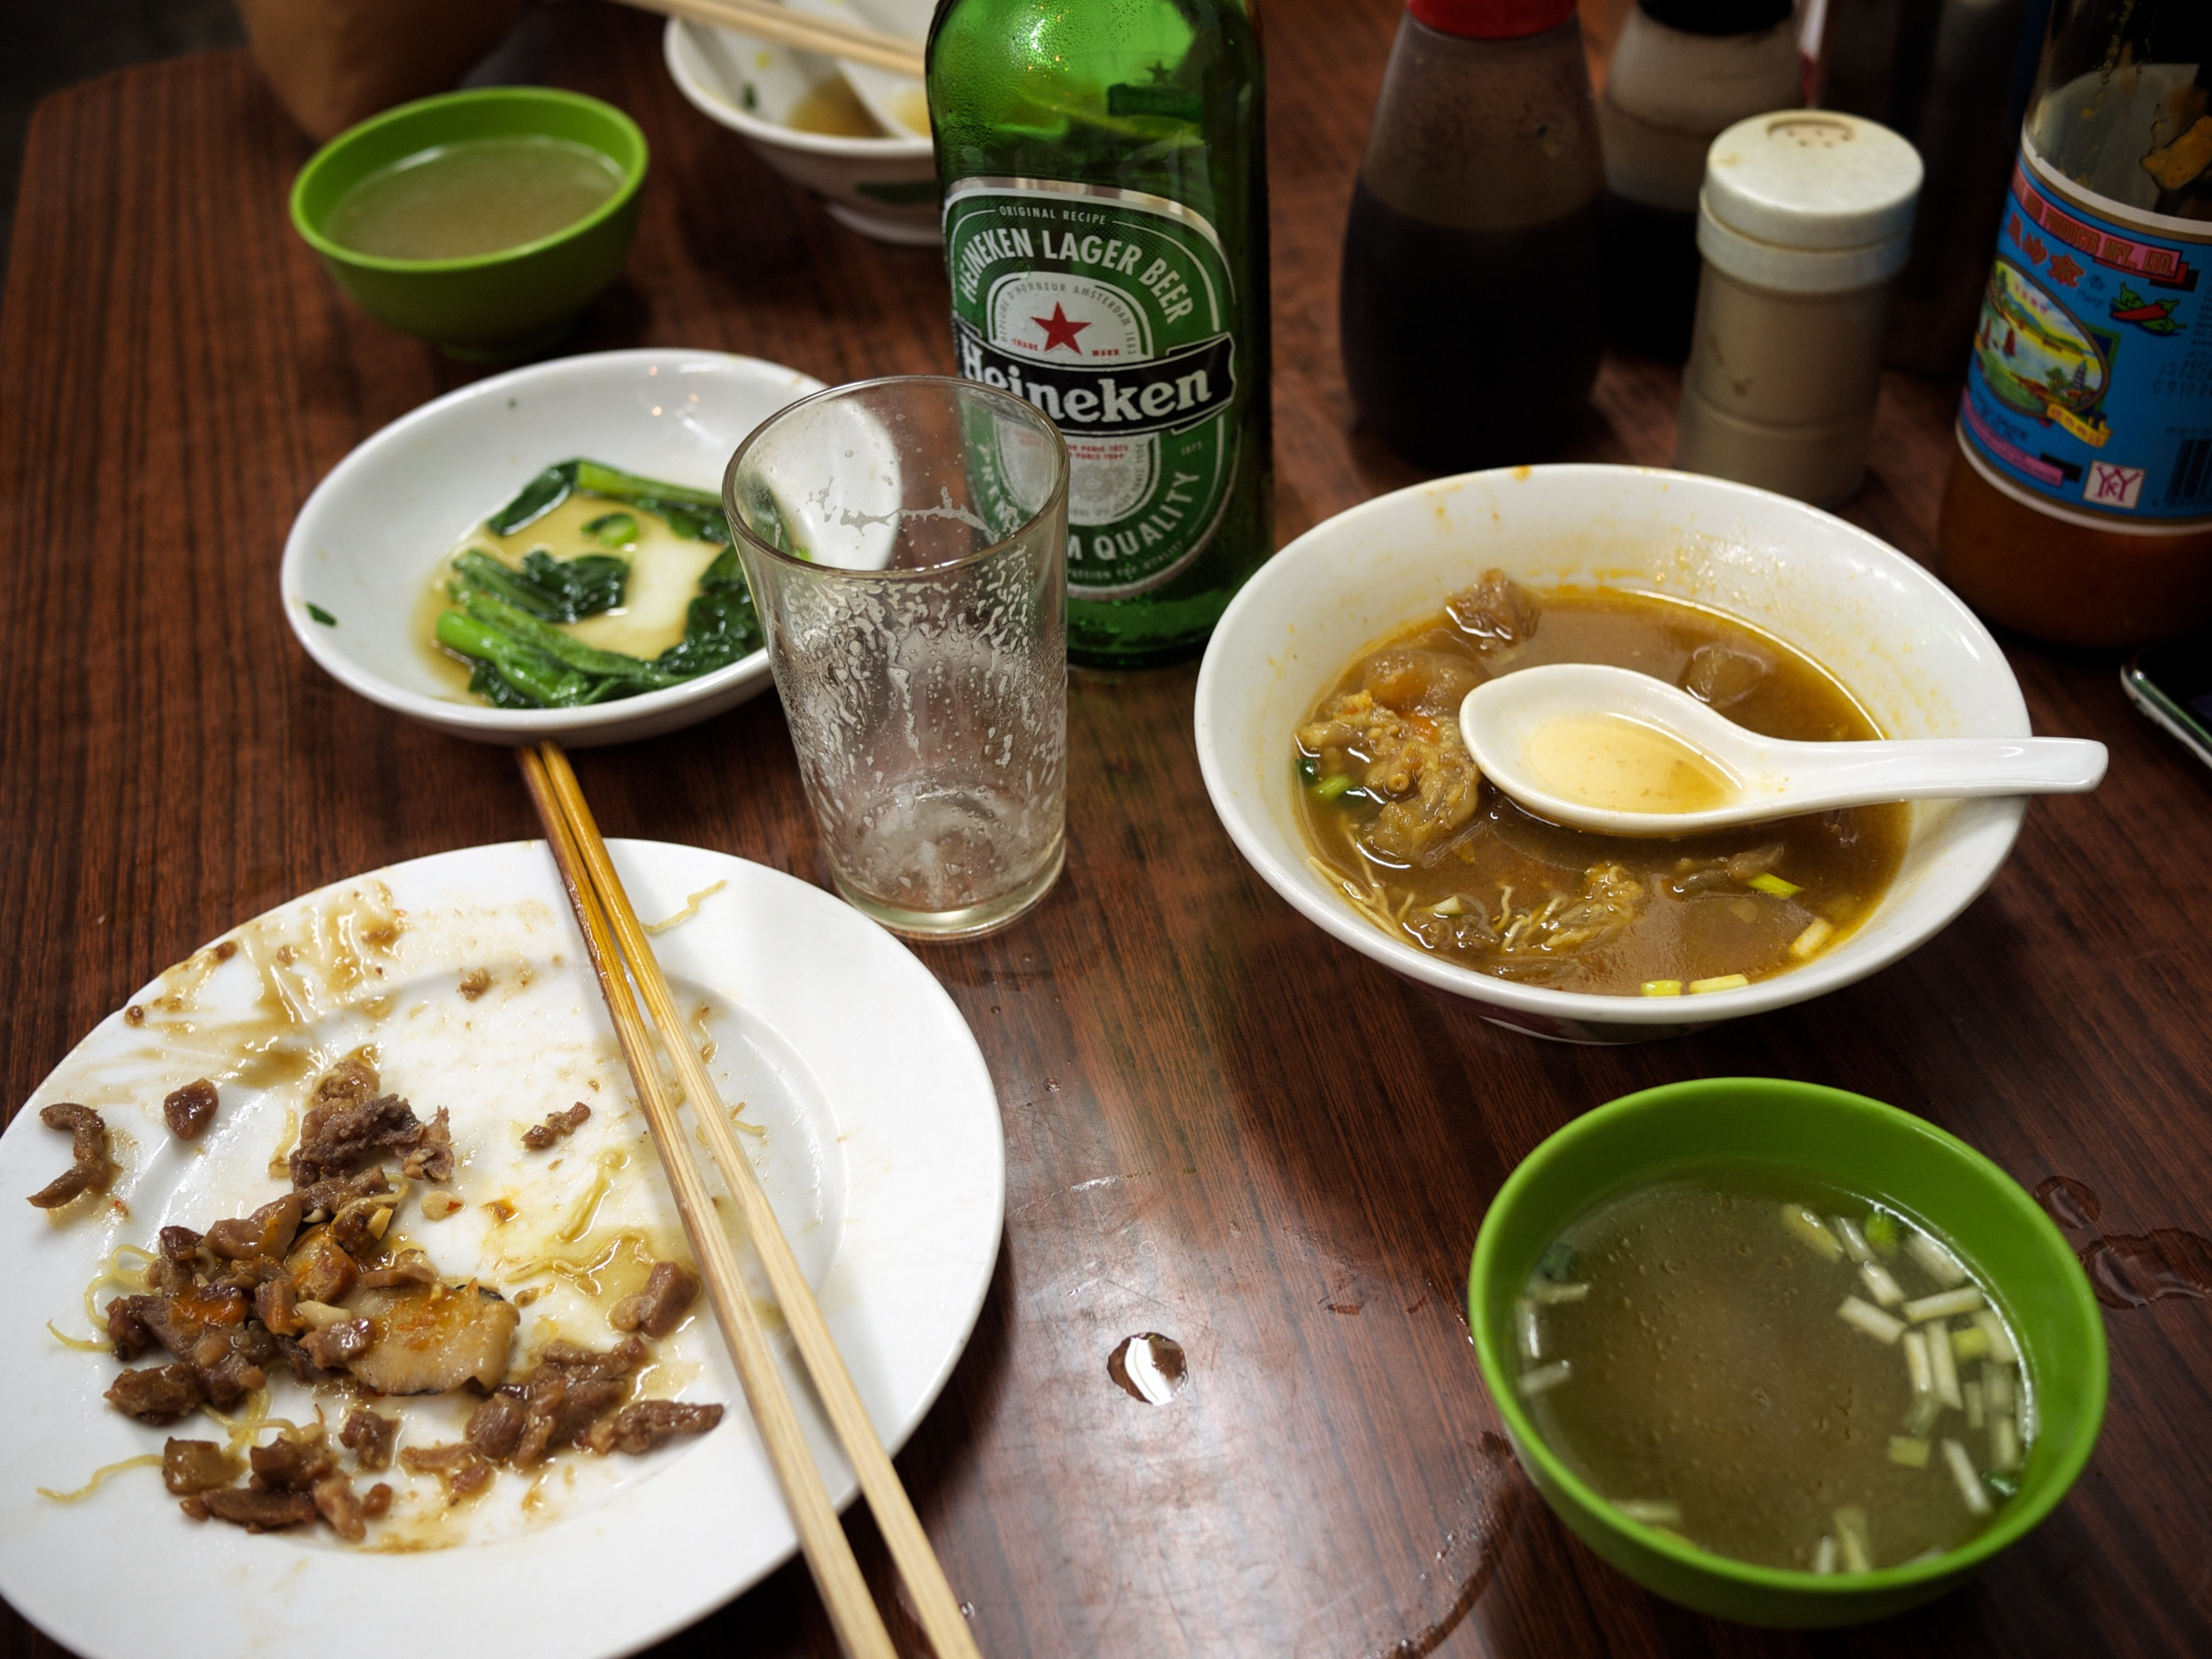 FOOD-Noodles_2011-09-08_20-21-58_P1040523_©JosephLinaschke2011.jpg